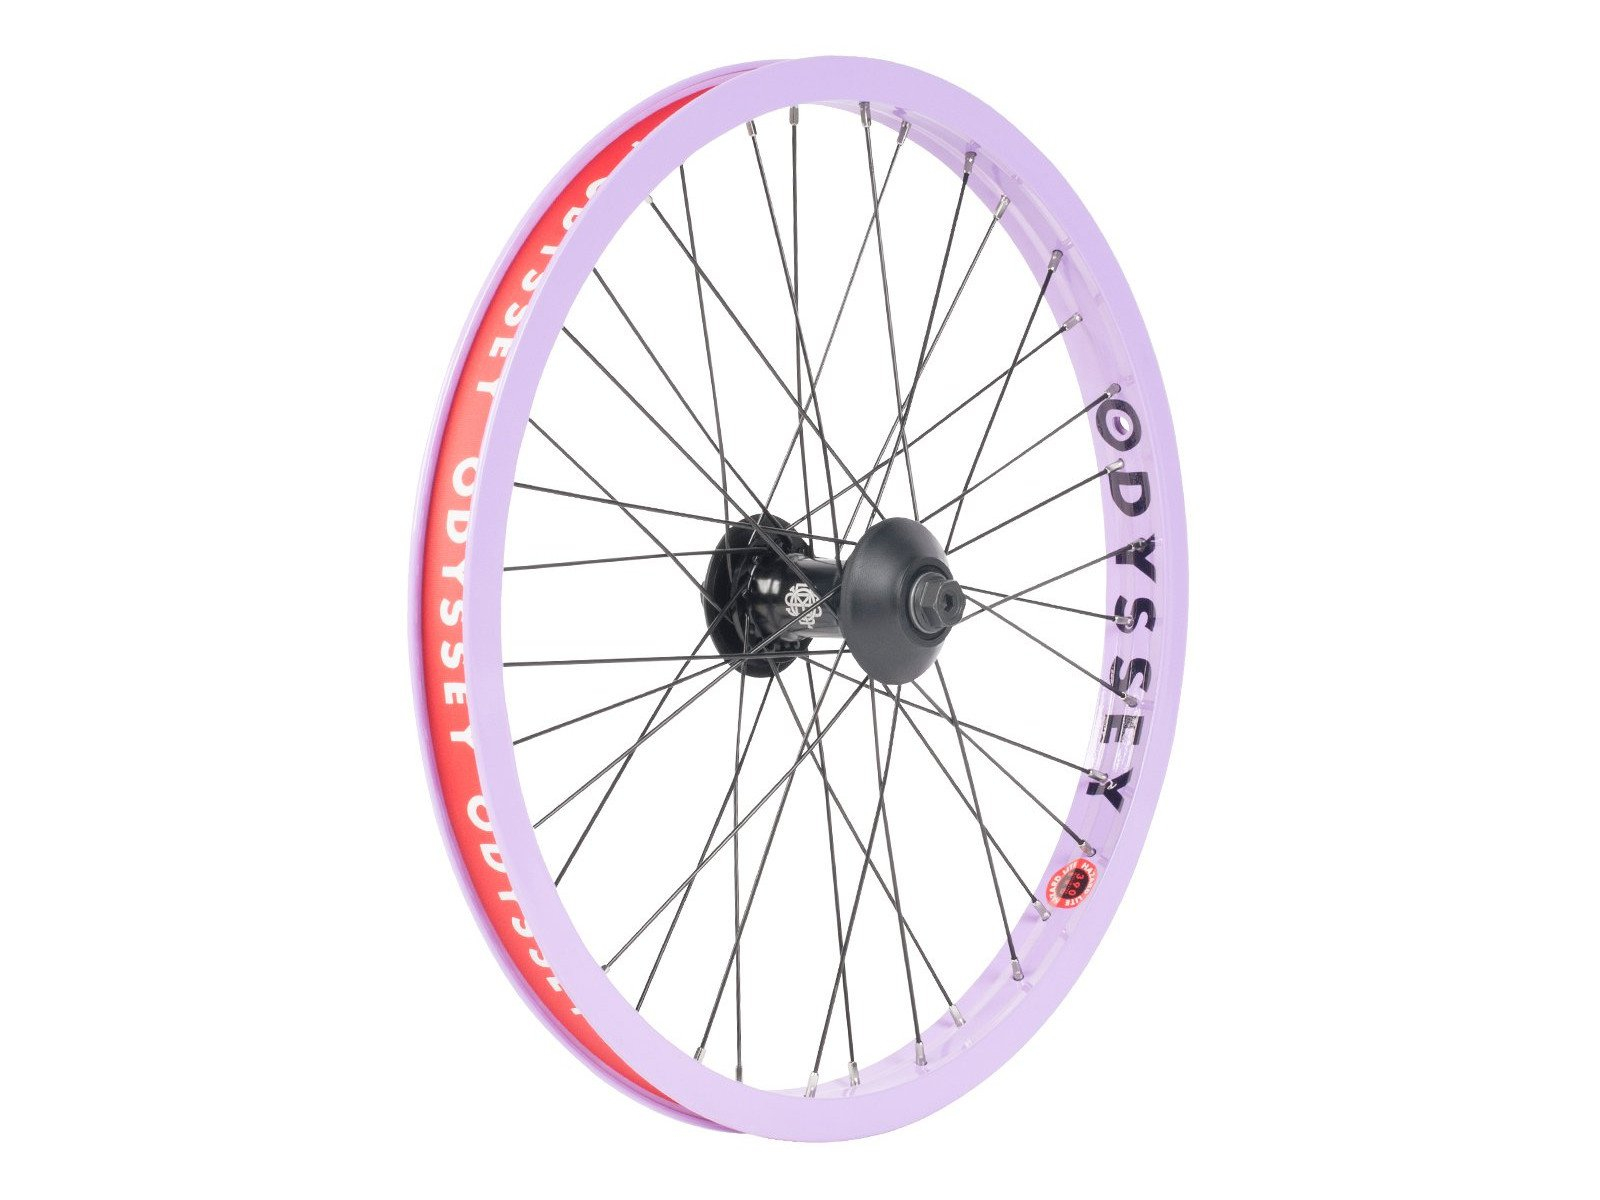 Hazard Lite Ruota Anteriore Completa Bmx odyssey   Colore Purple